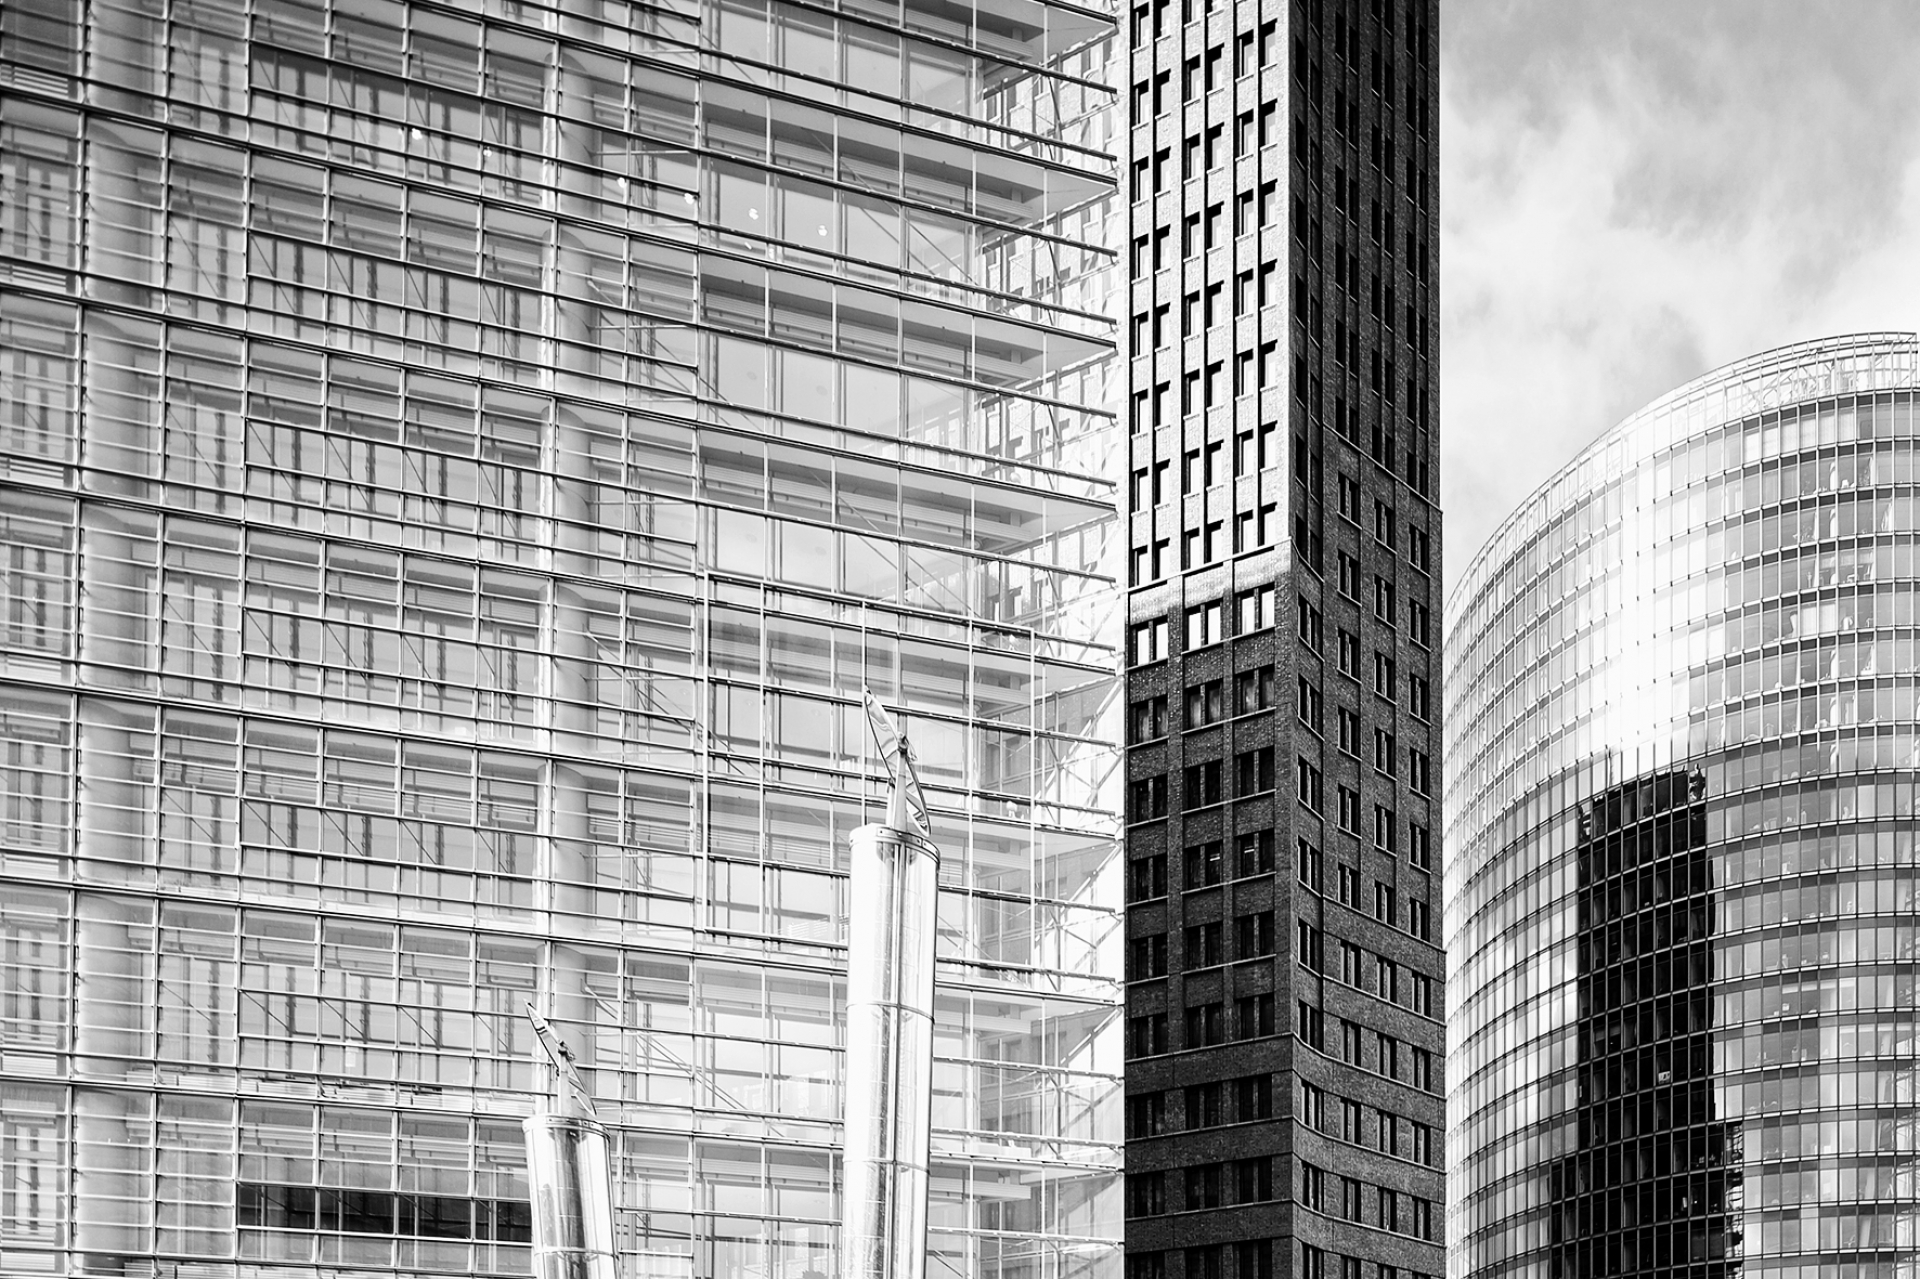 Architektur & Street Photography - Canon Academy Architektur